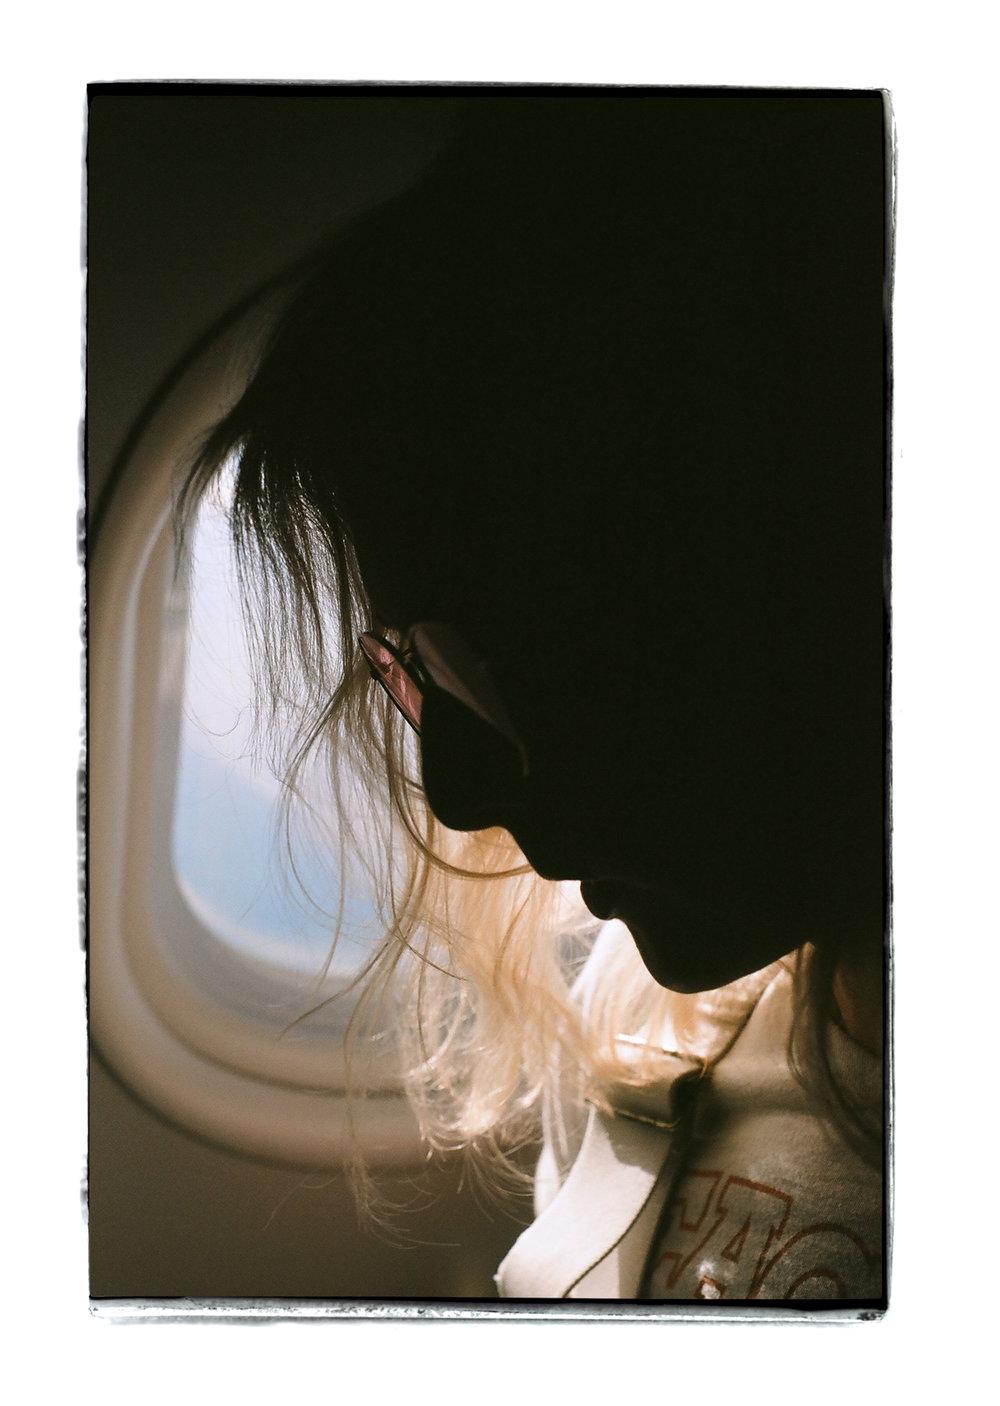 Avery_Plane.jpg